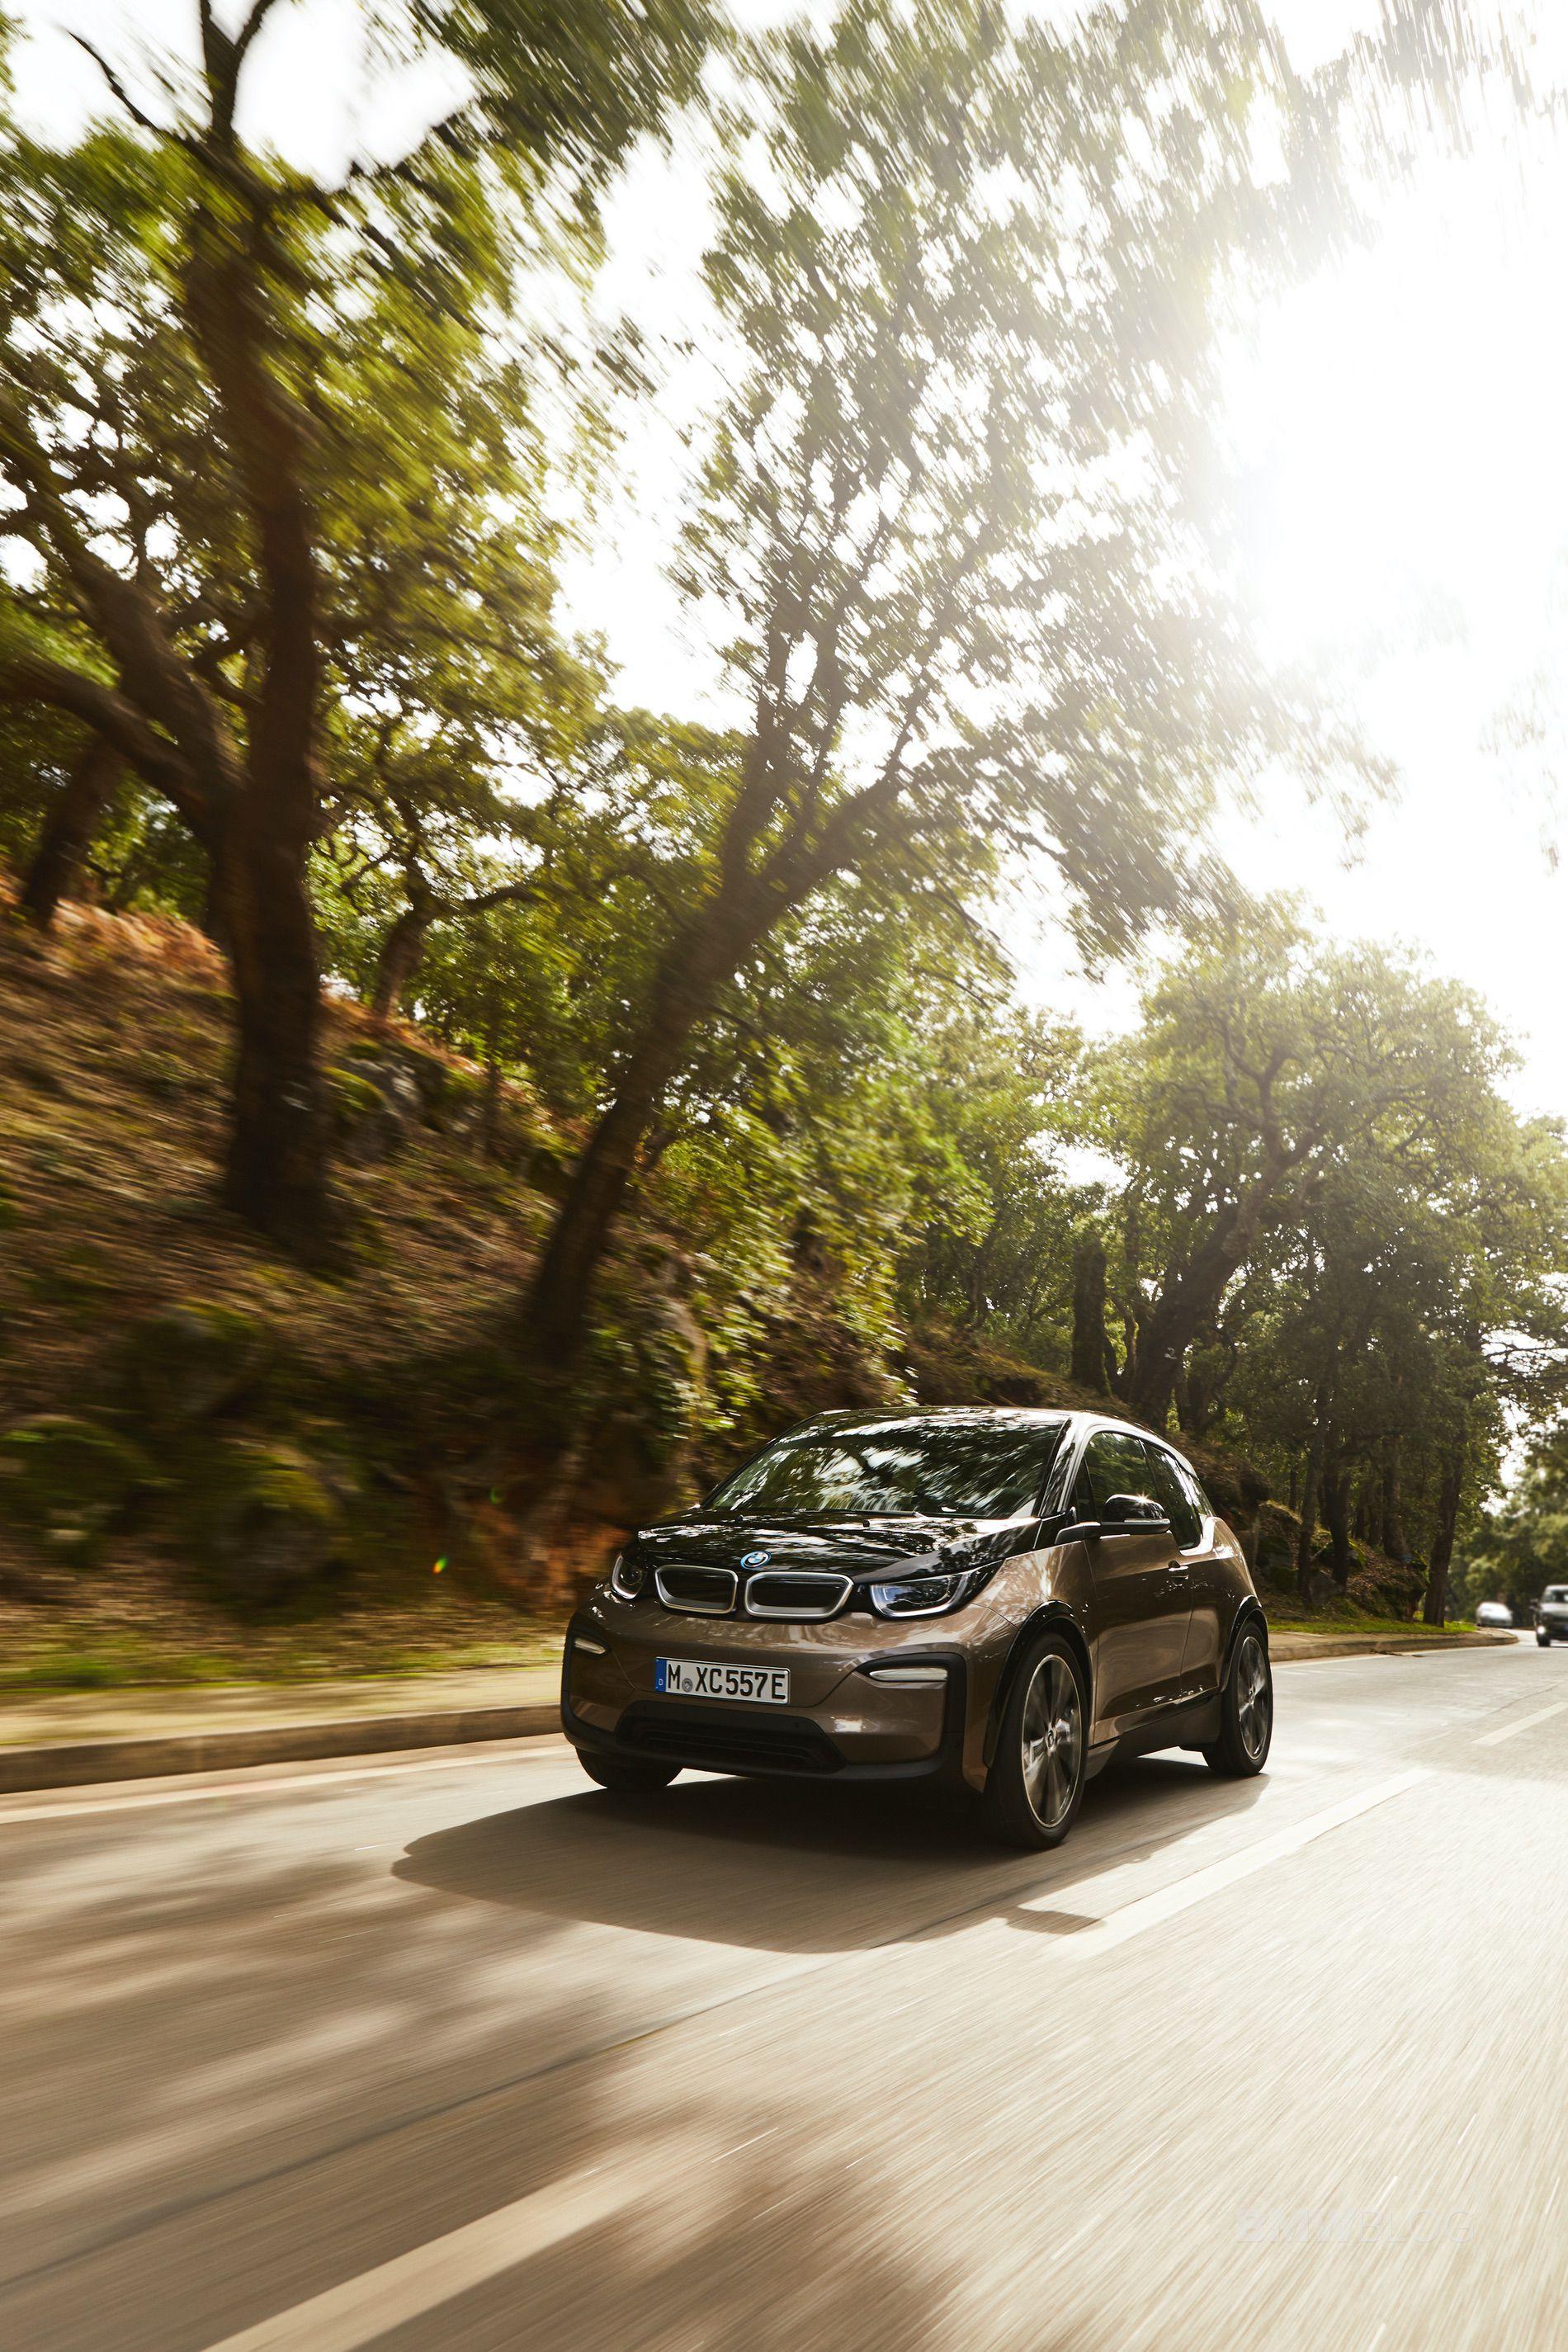 BMW i3 Jucaro Beige Metallic 22